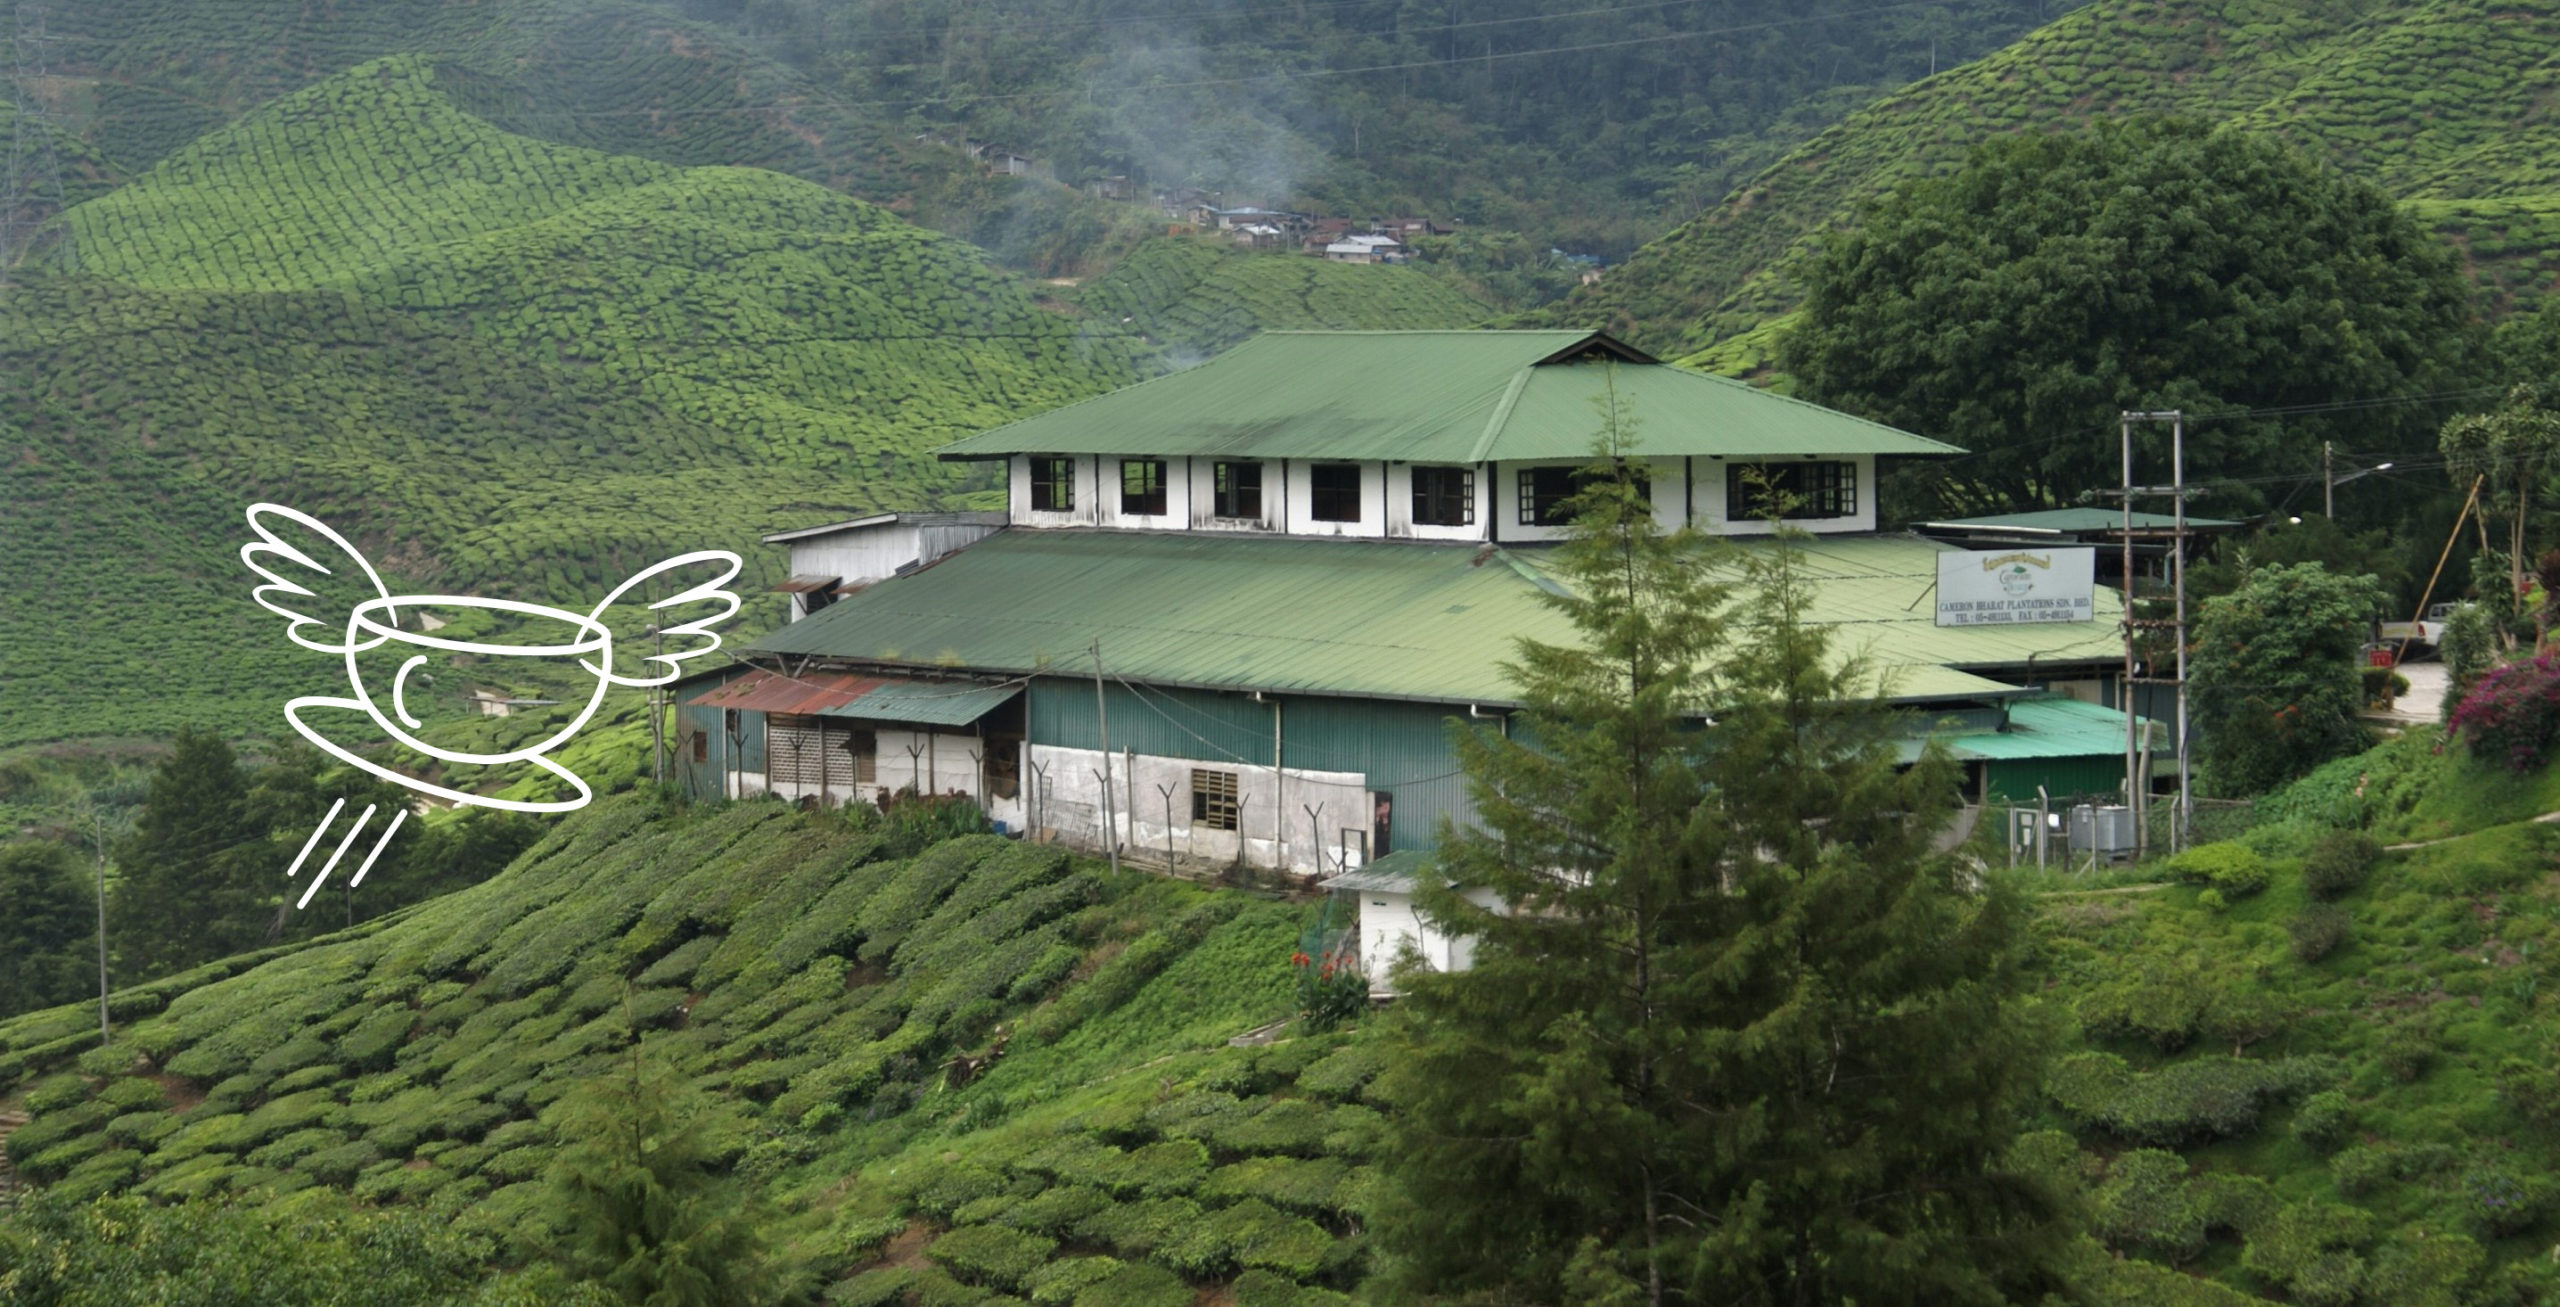 Fabrique de thé en Malaisie